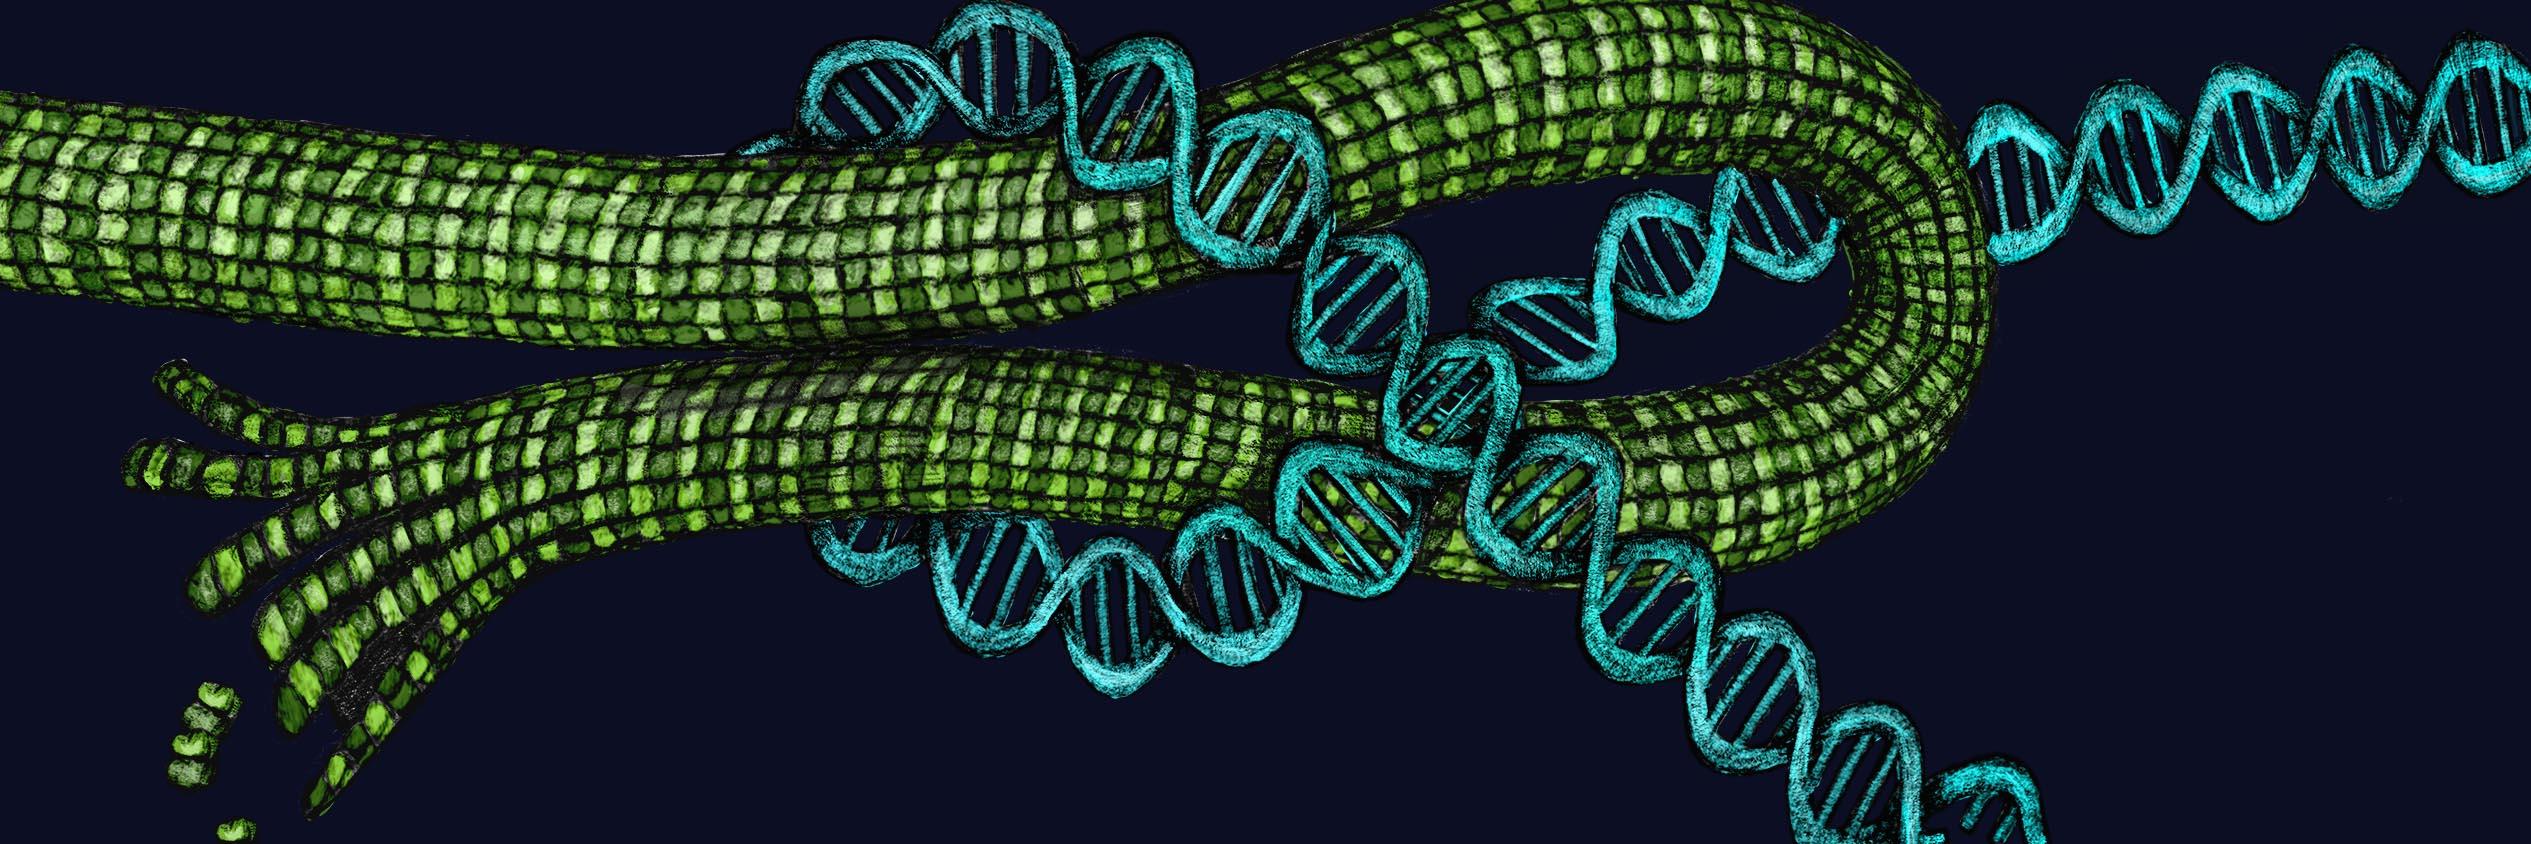 Microtubules sensing stress